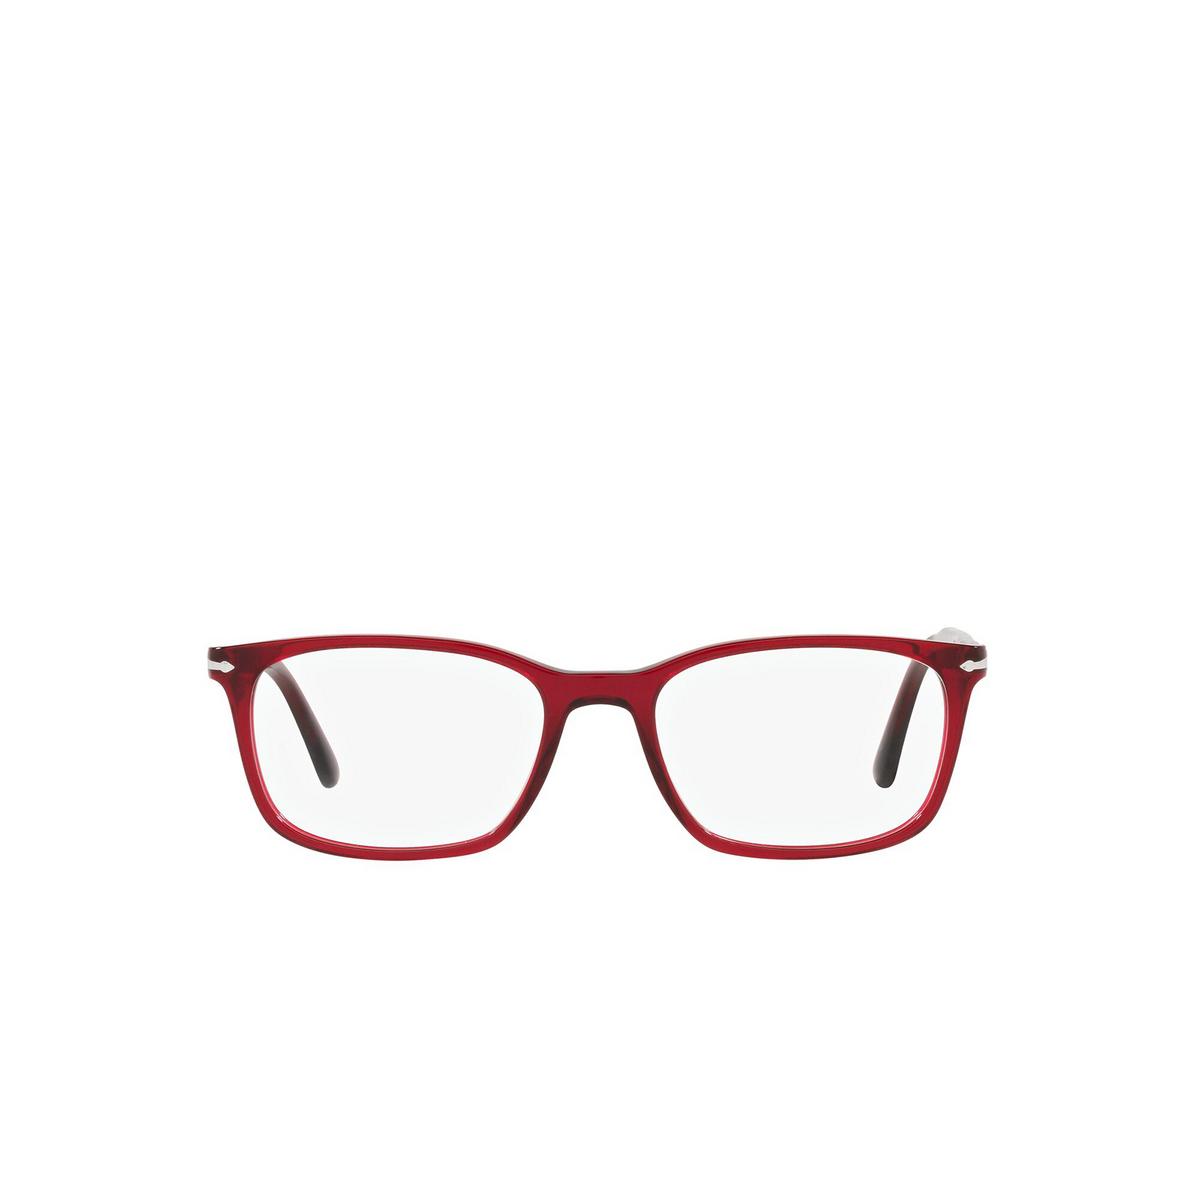 Persol® Rectangle Eyeglasses: PO3189V color Transparent Red 126 - front view.